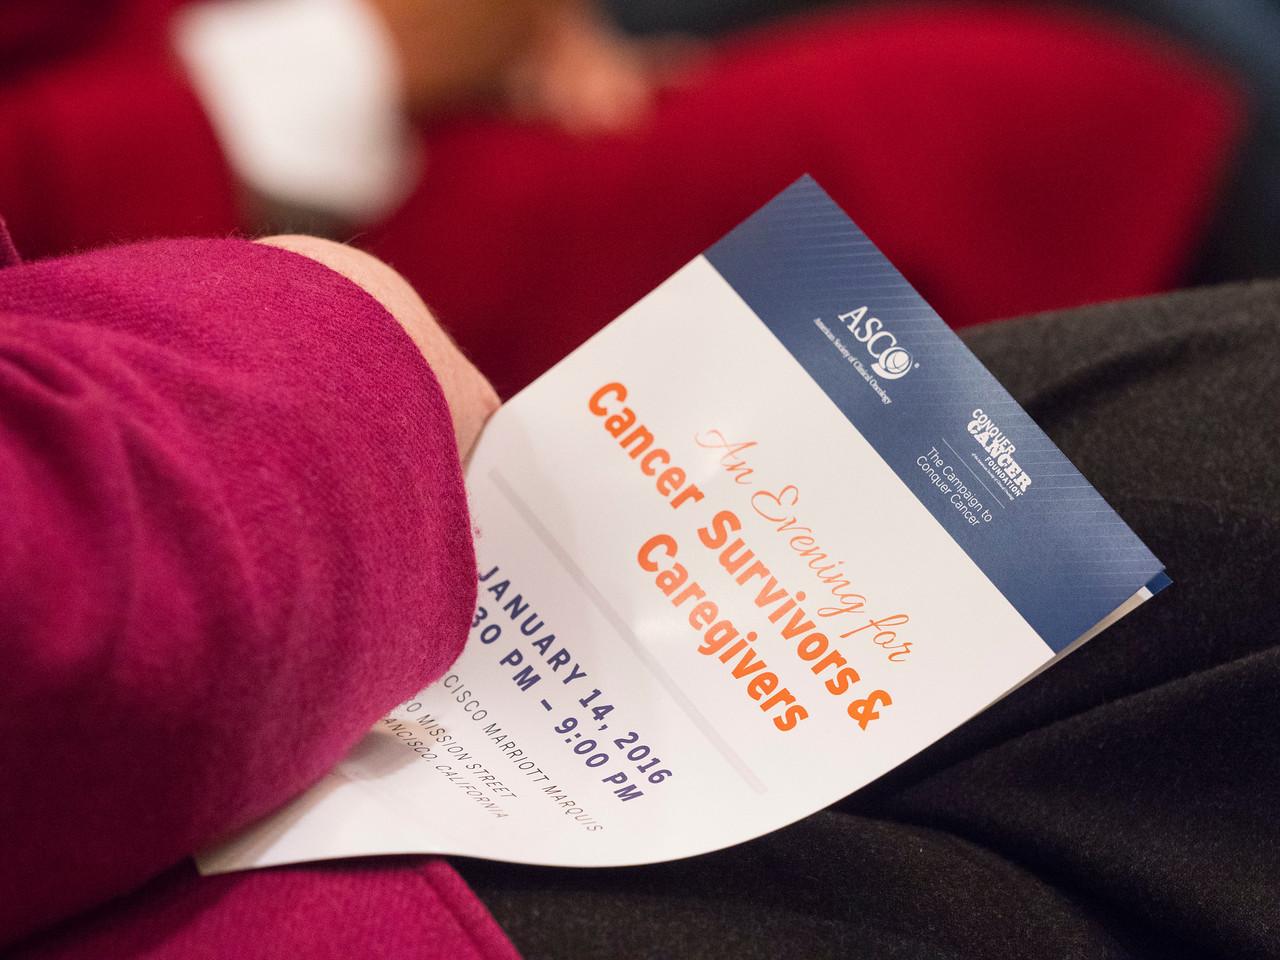 ASCO President Julie Vose, MD, FASCO, speaks - An Evening for Cancer Survivors and Caregivers